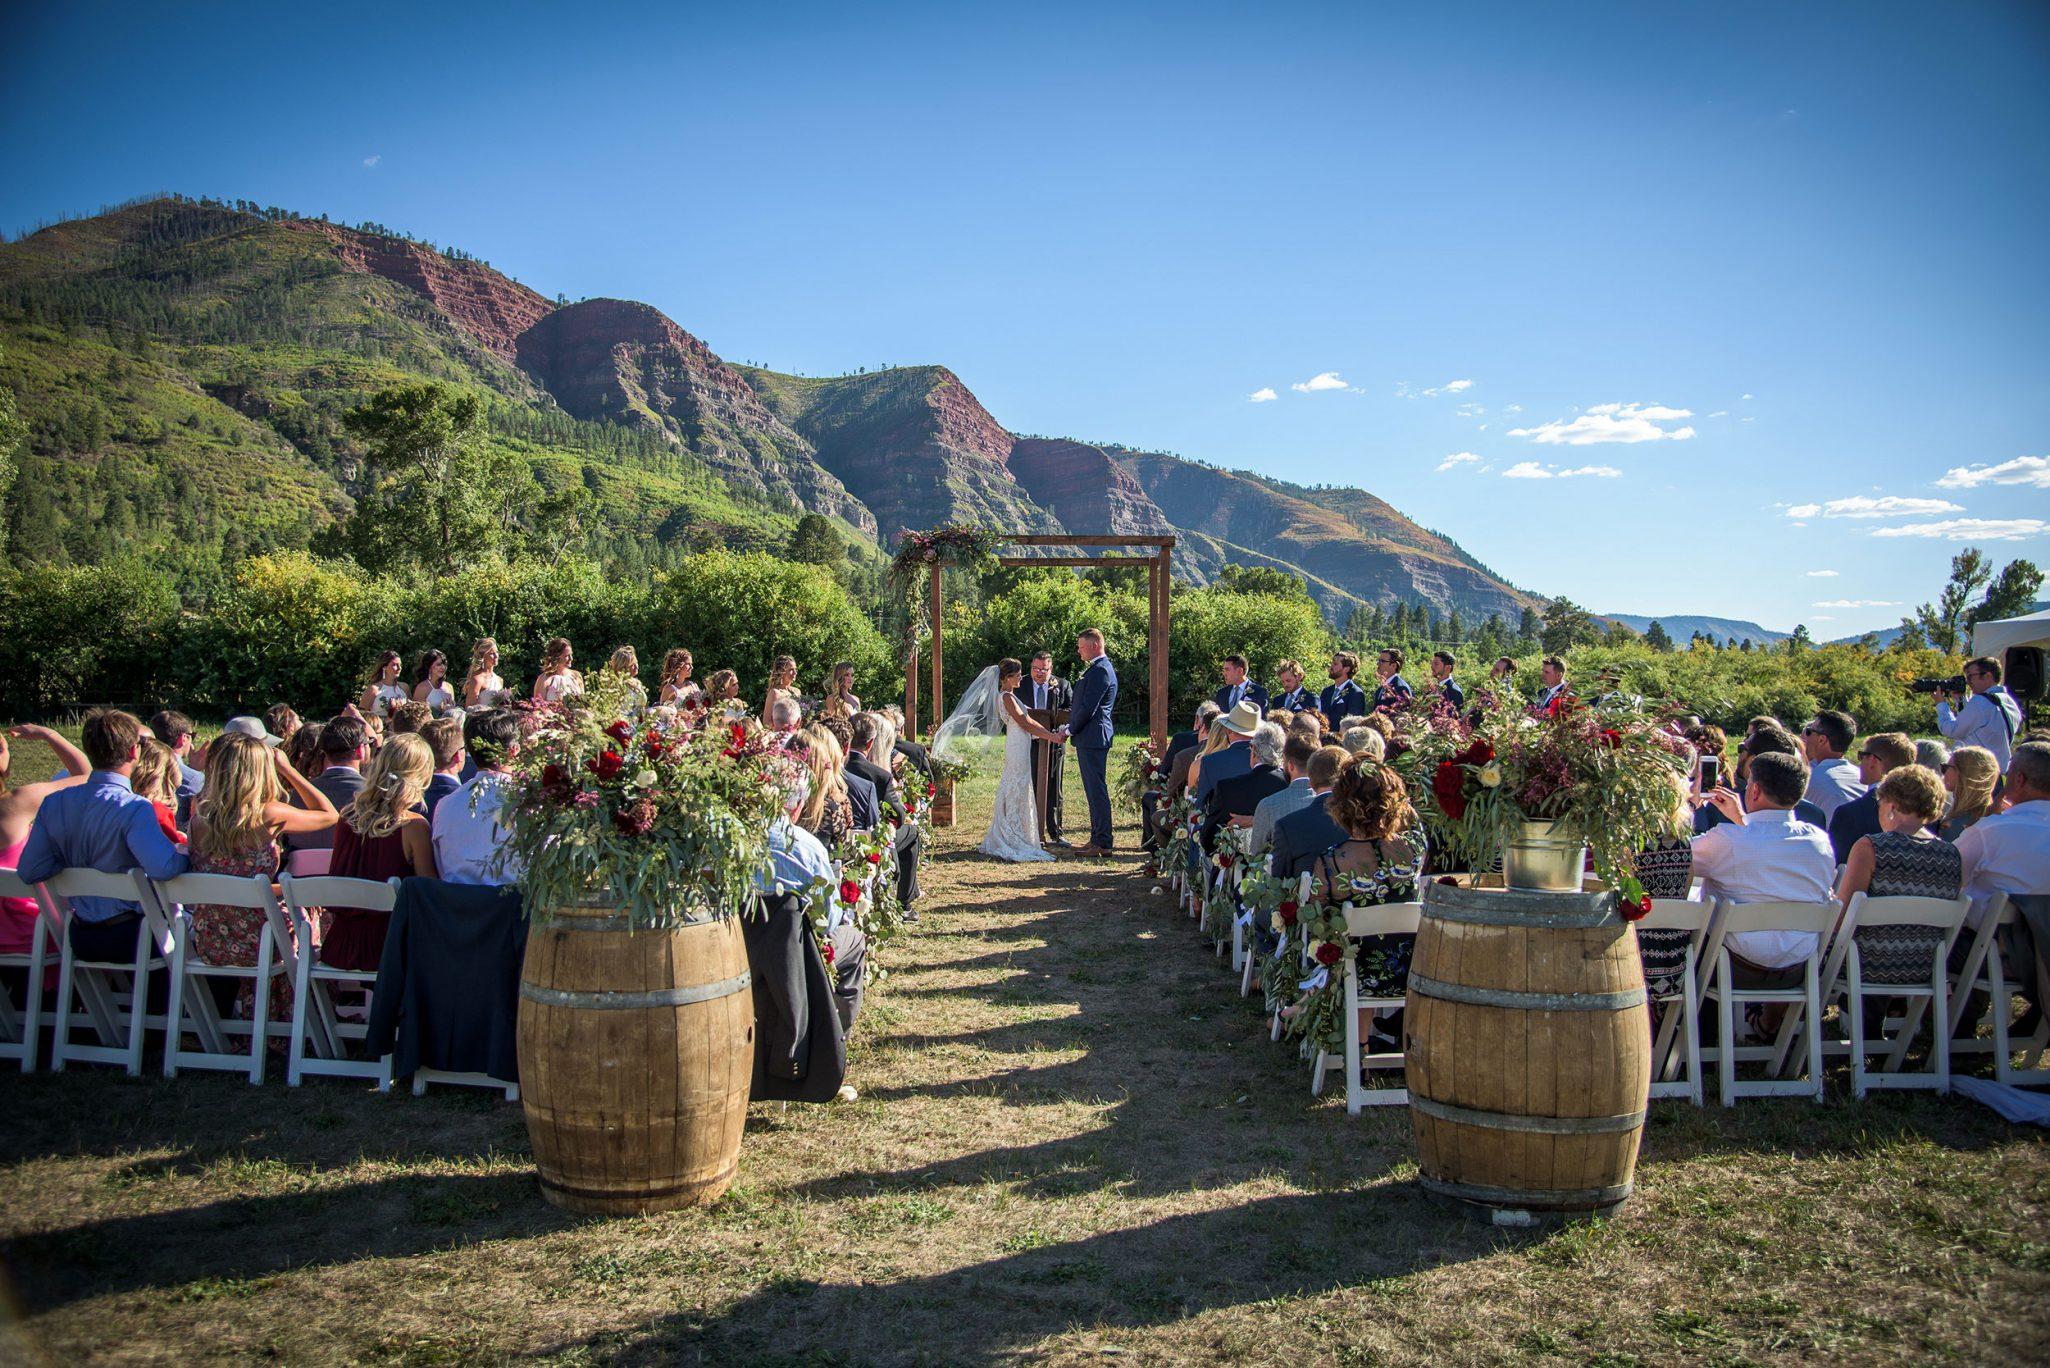 Durango wedding ceremony with mountain views